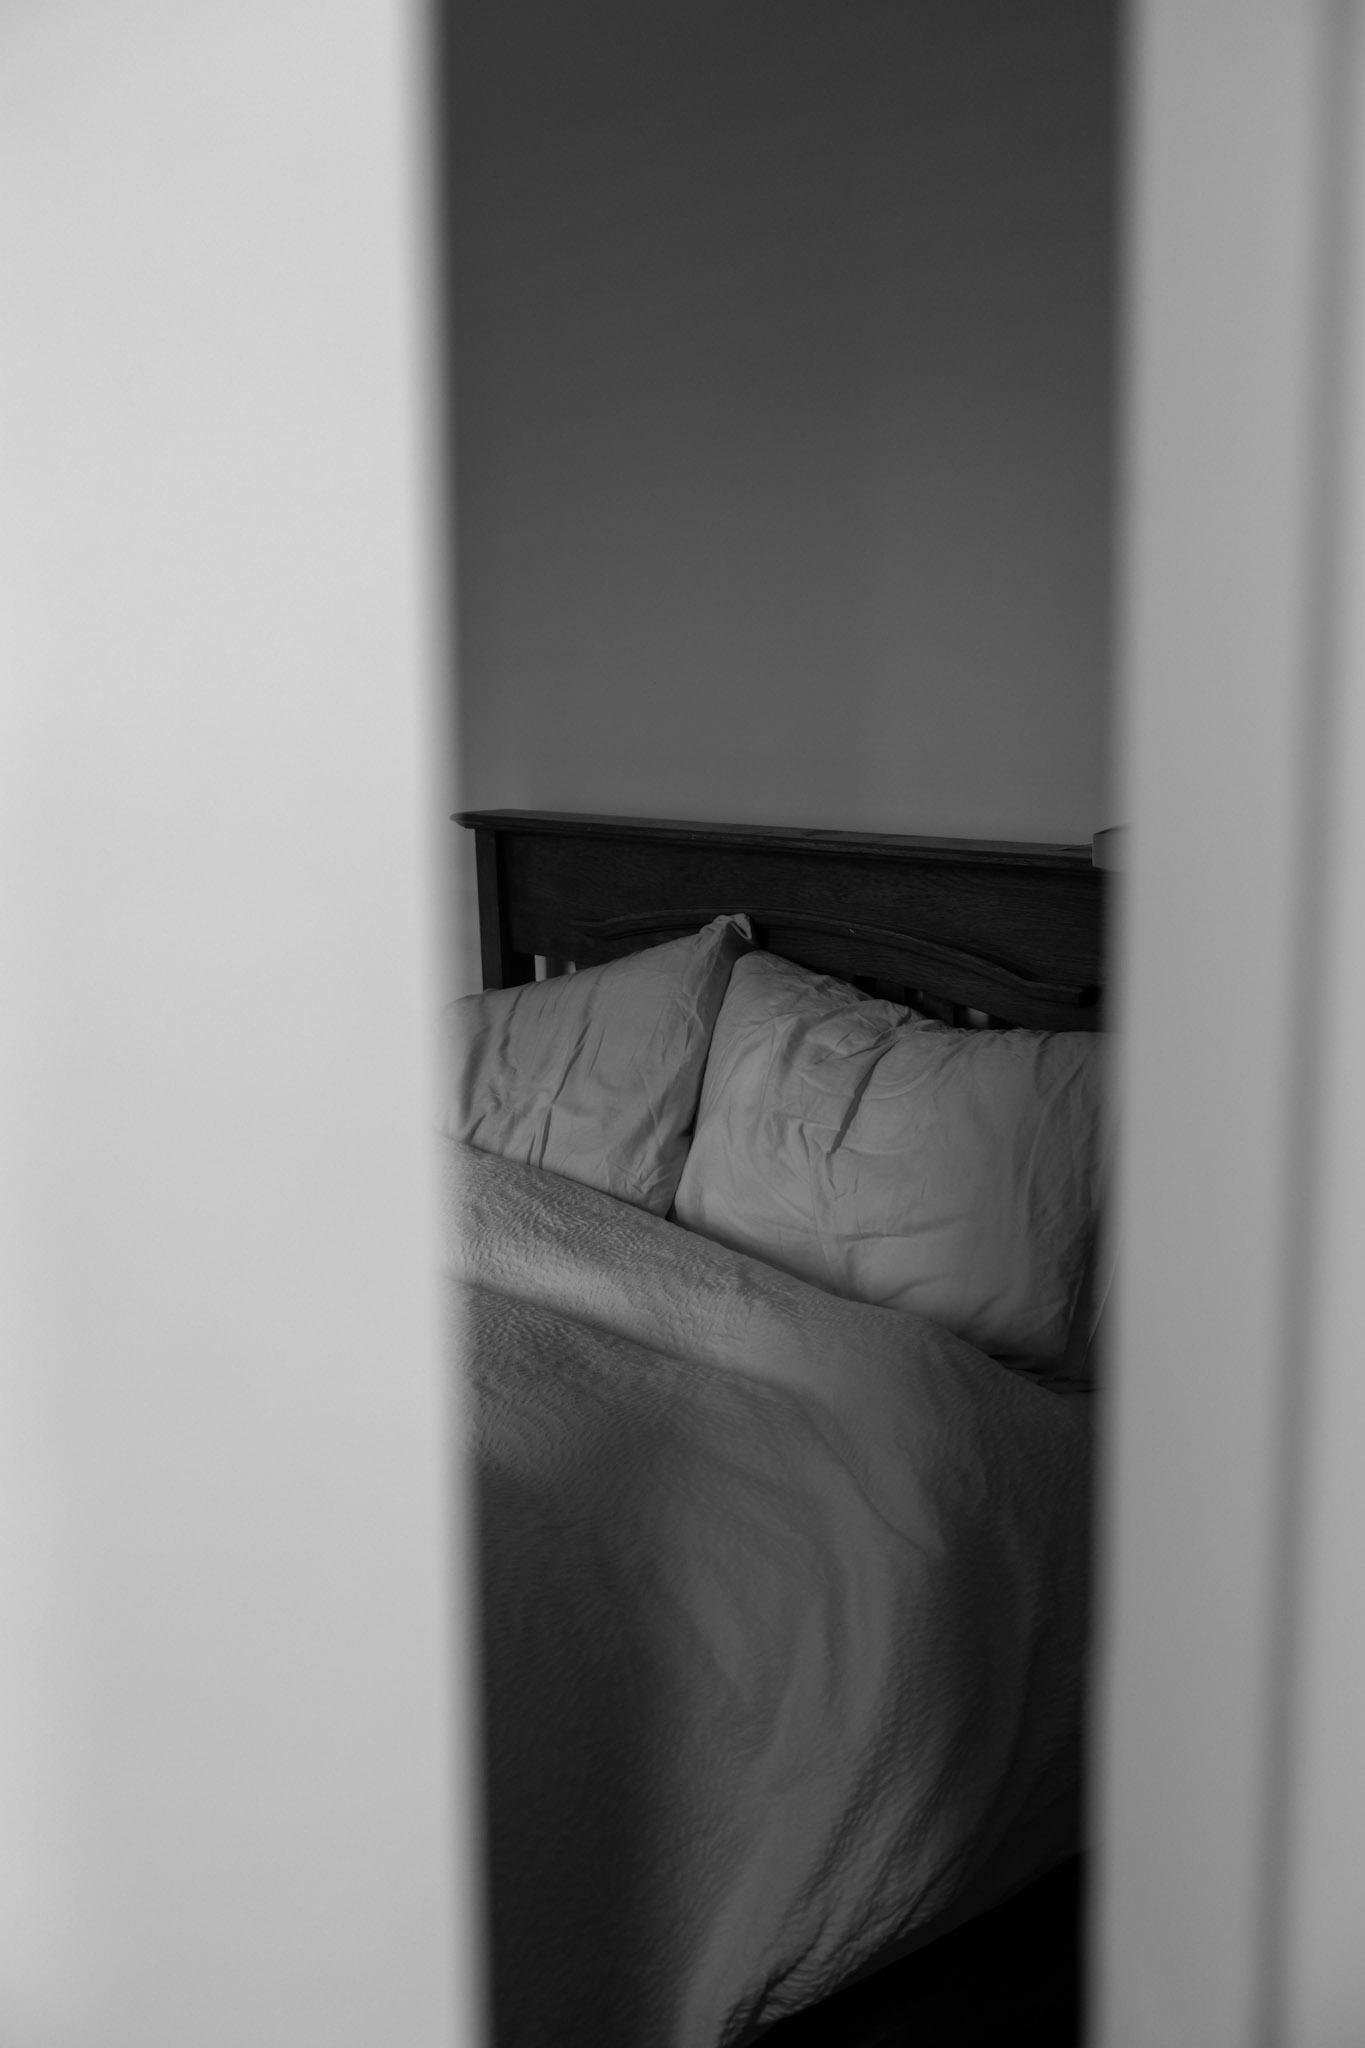 Bedroom, sleeve drama, morning light, white cotton sheets through doorway